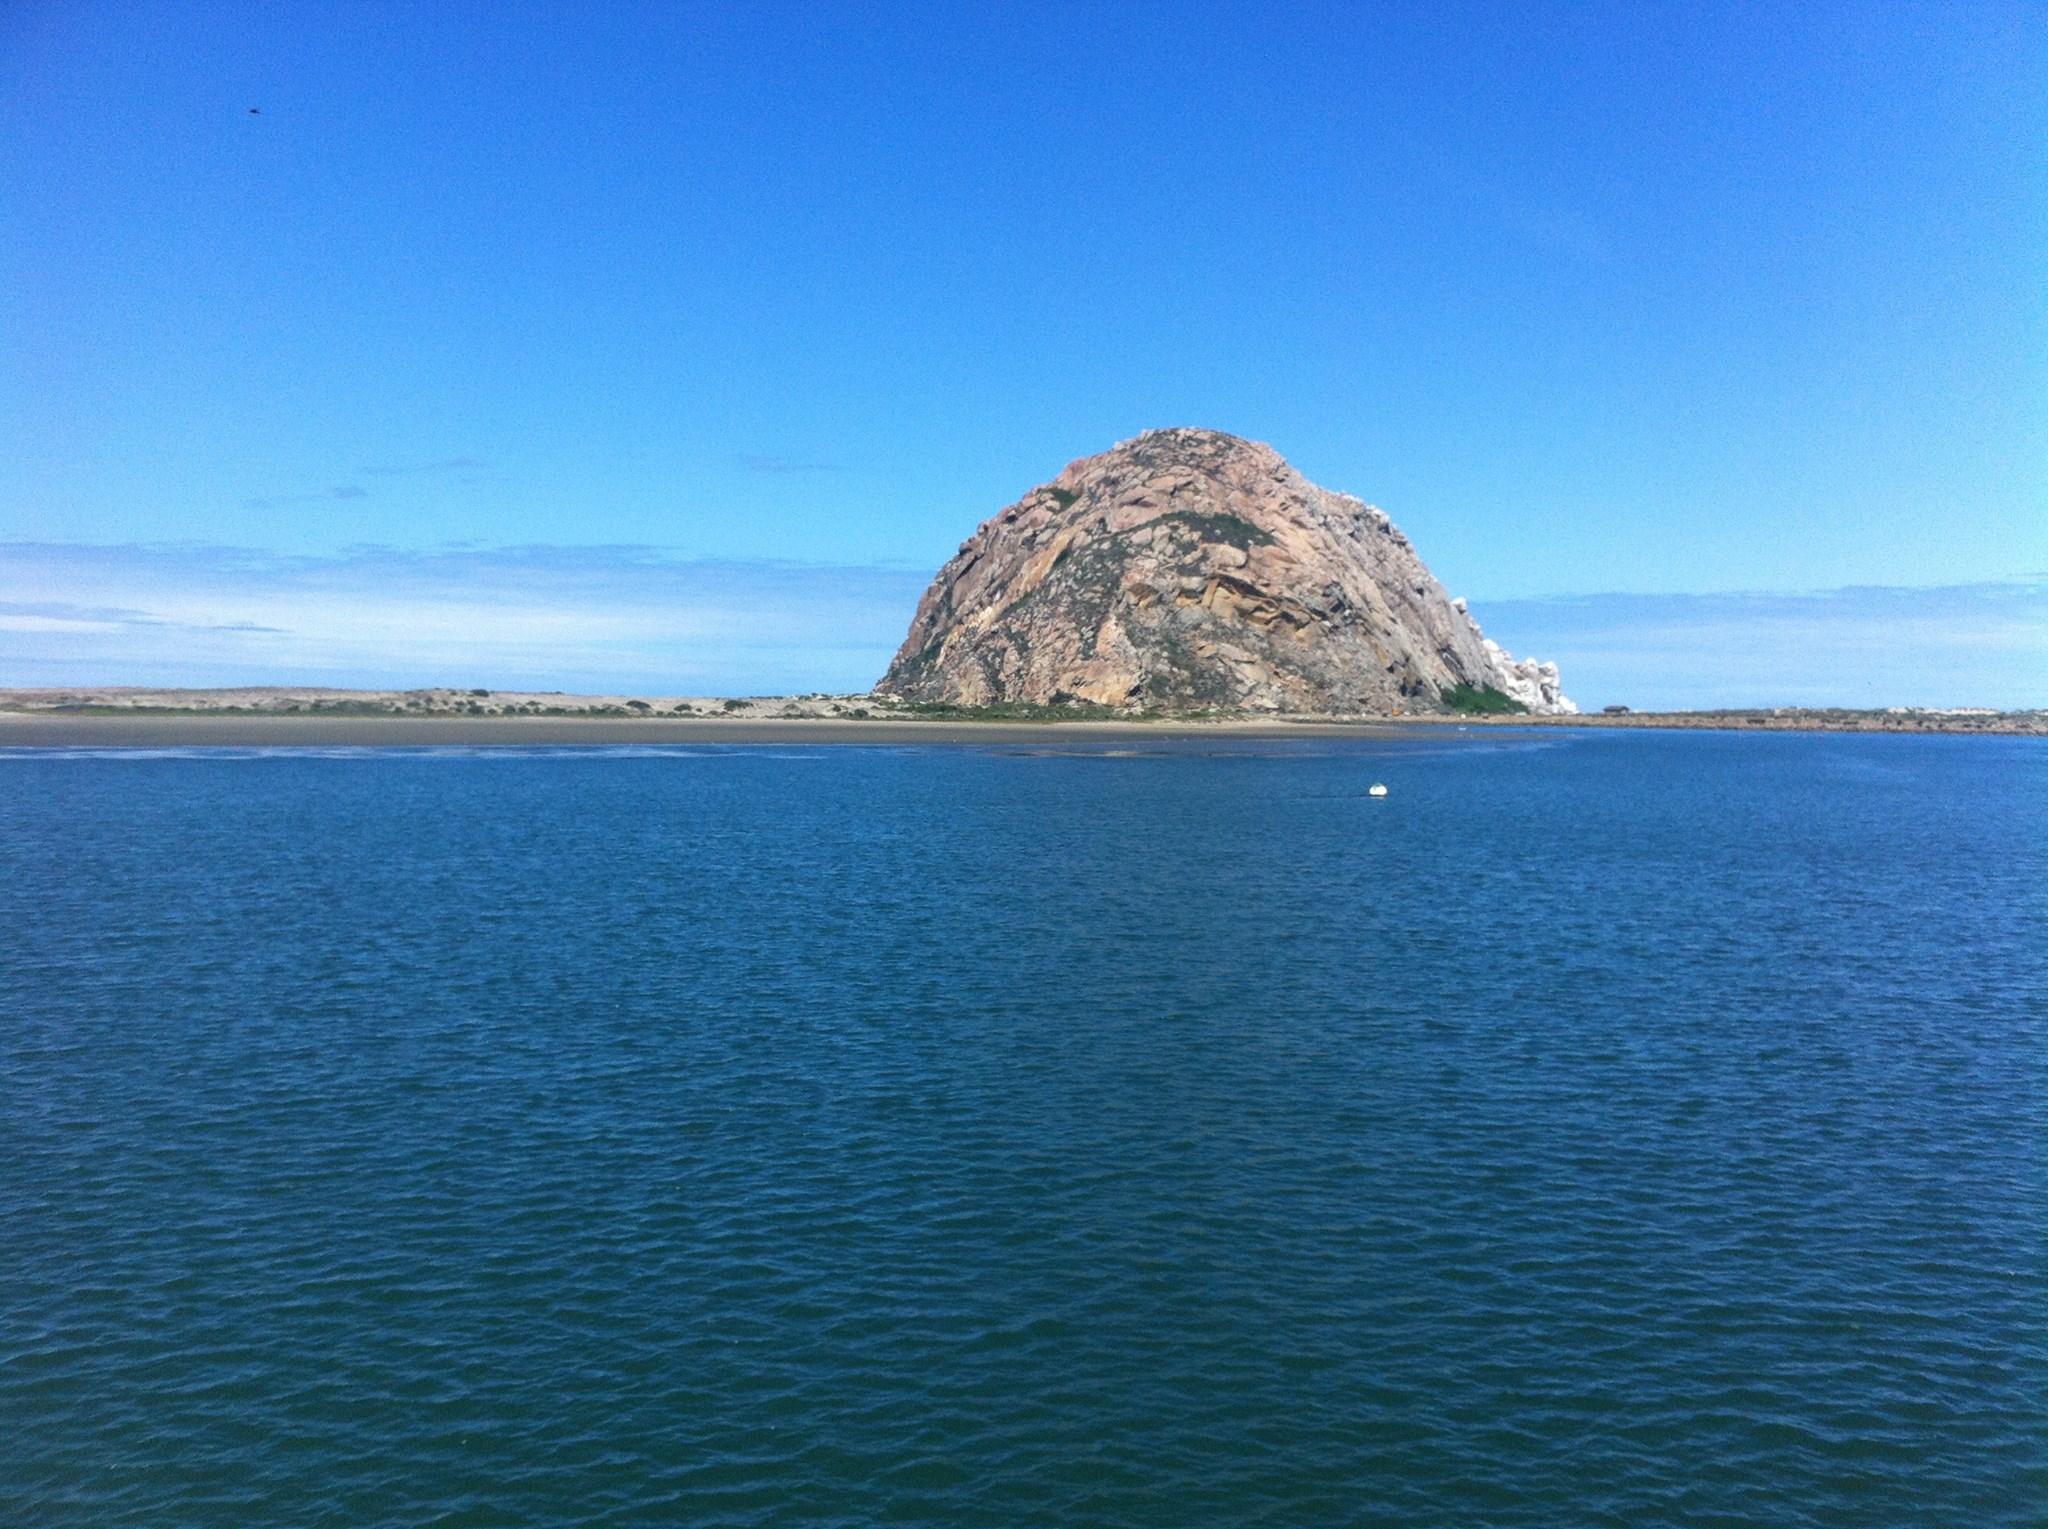 Morro Bay: Often called the